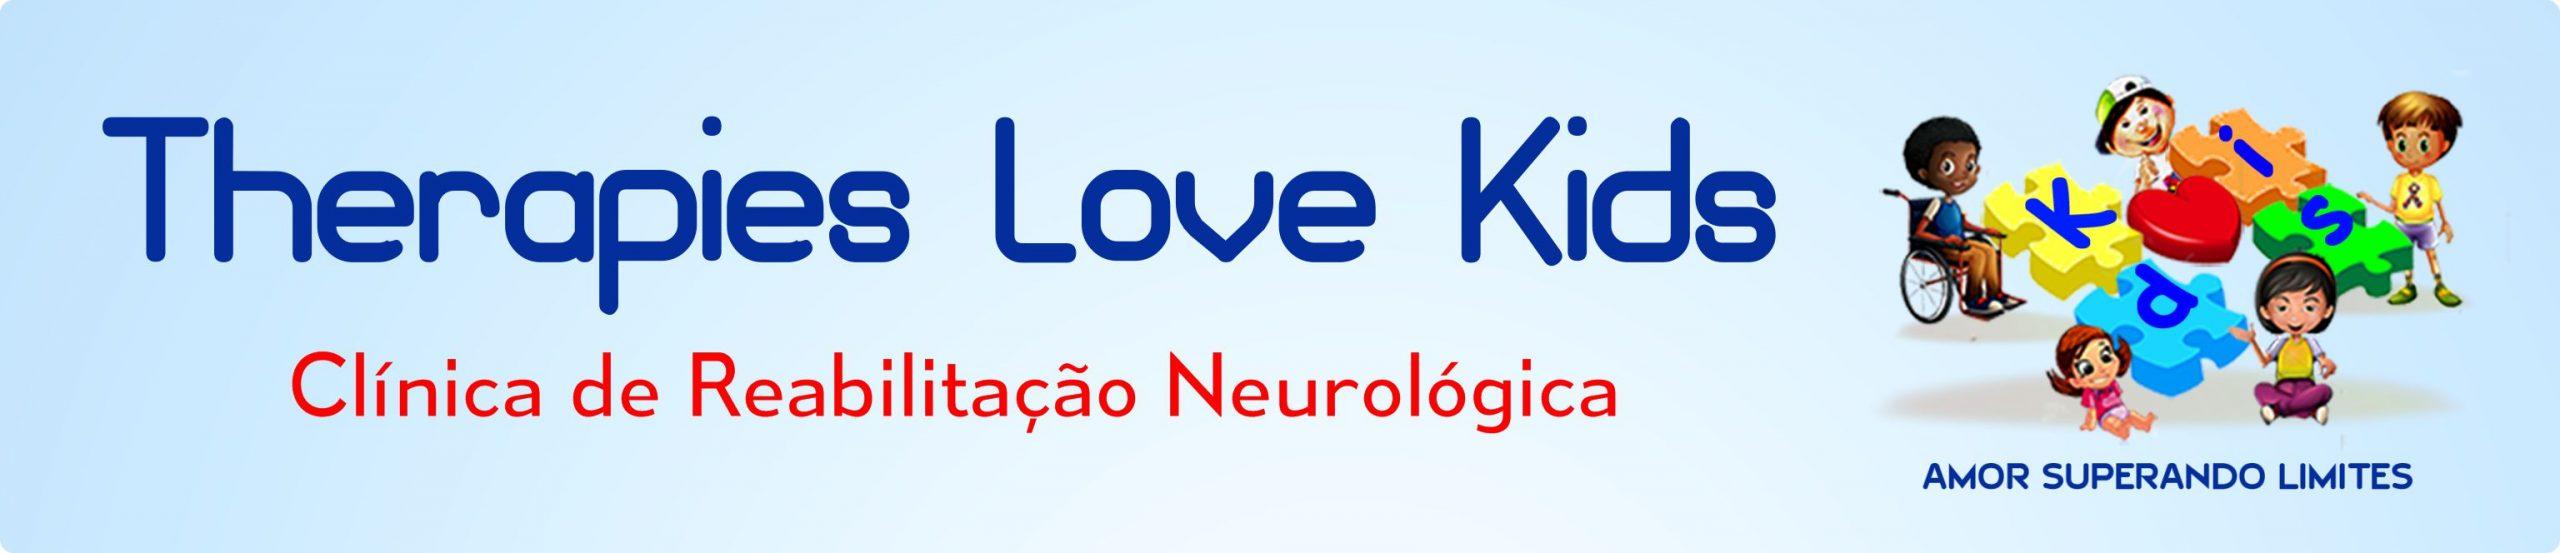 Therapies Love Kids